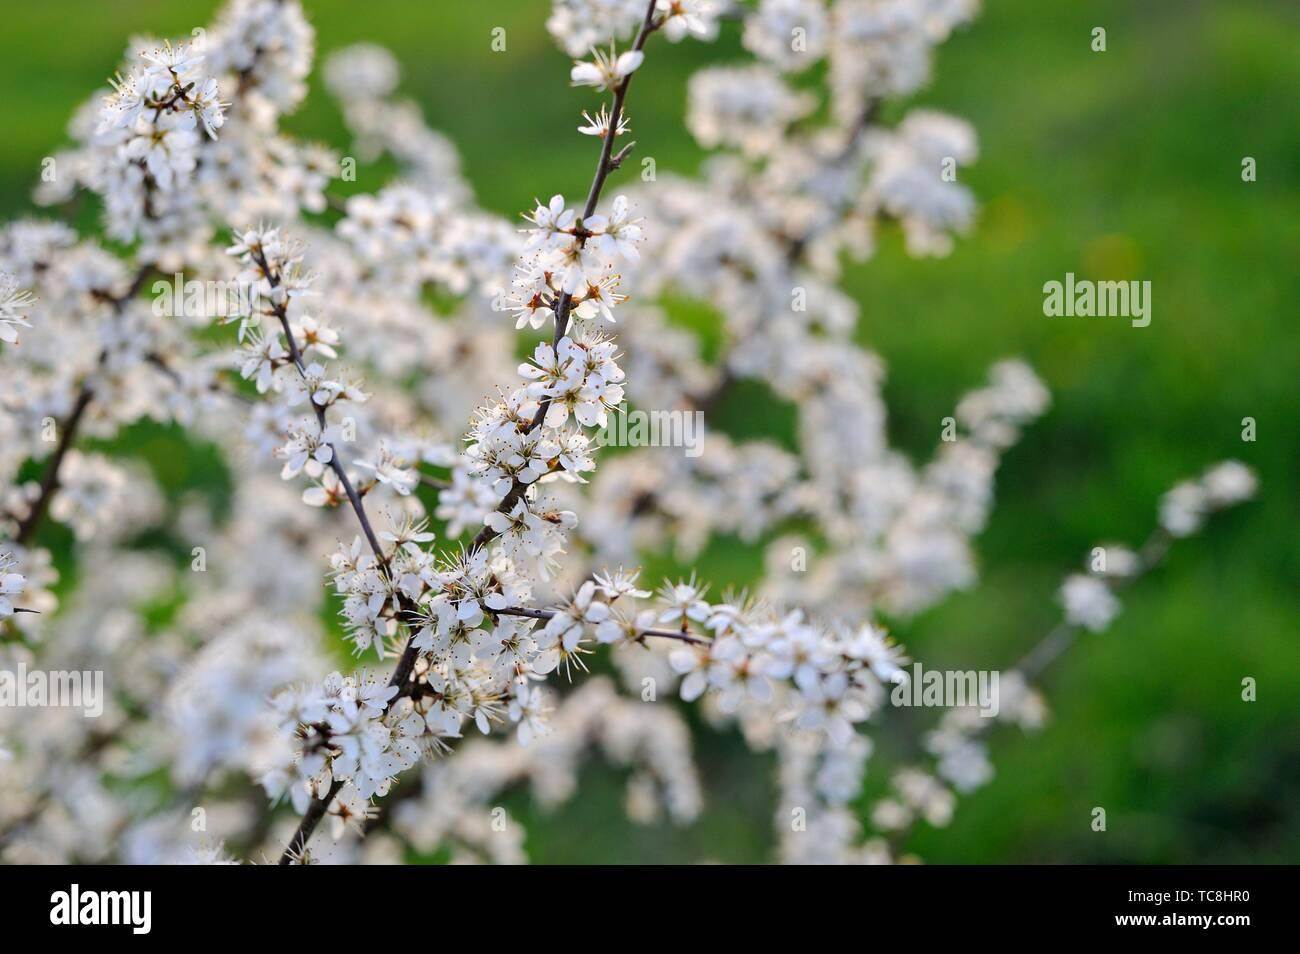 blackthorn shrub (Prunus spinosa), Eure-et-Loir department, Centre-Val de Loire region, France, Europe. - Stock Image